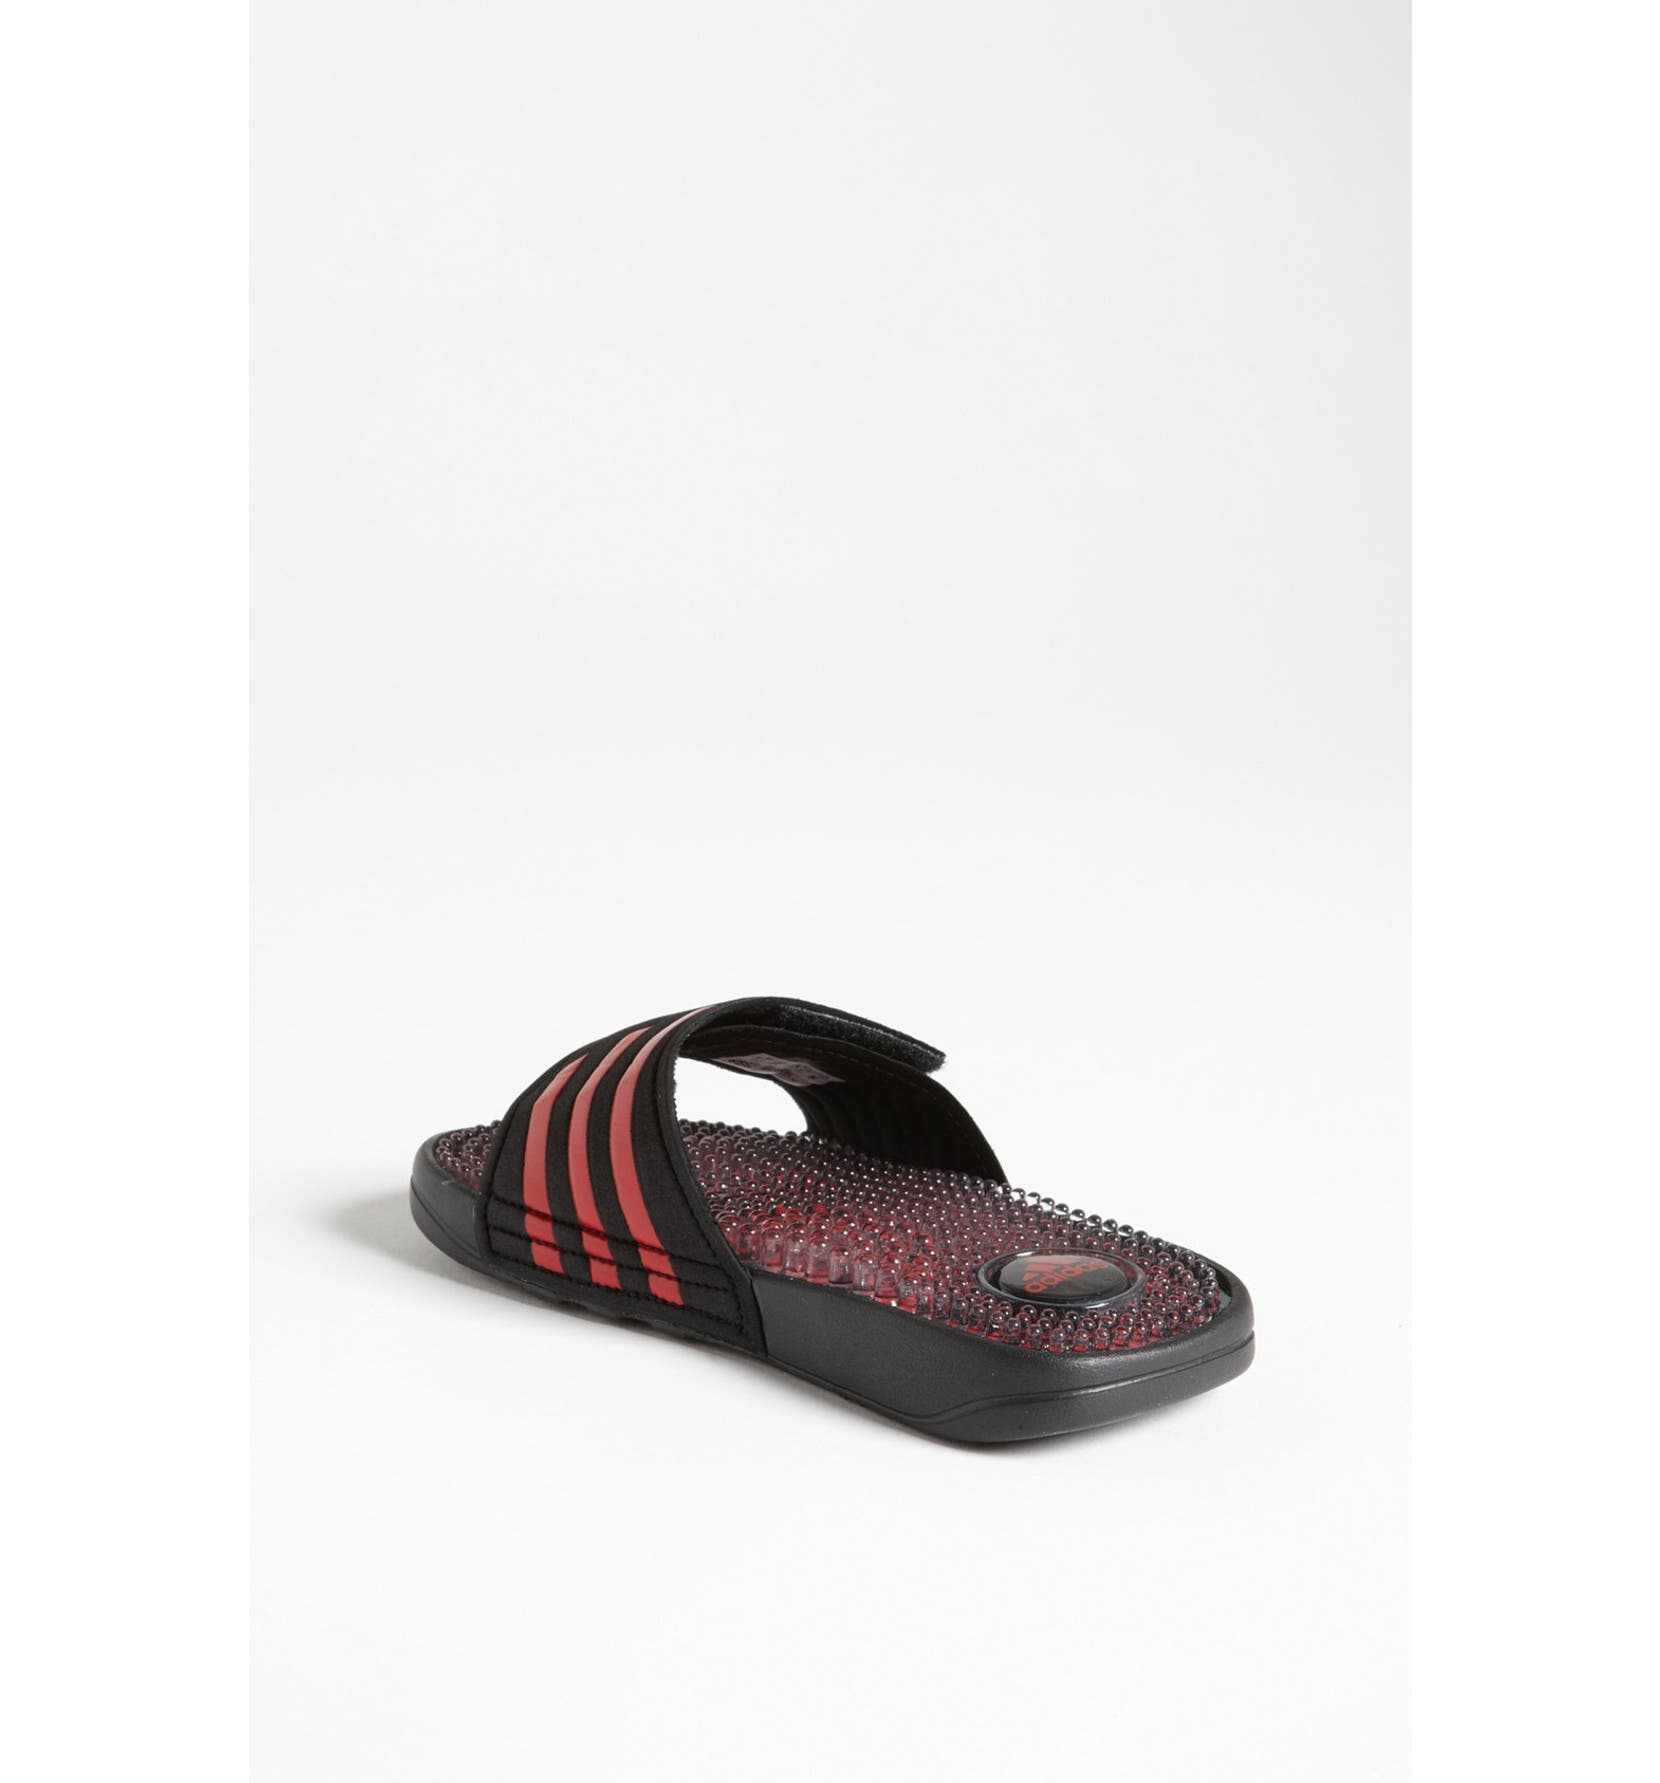 e418386abd2a2 adidas  Adissage - Fade  Sandal (Toddler